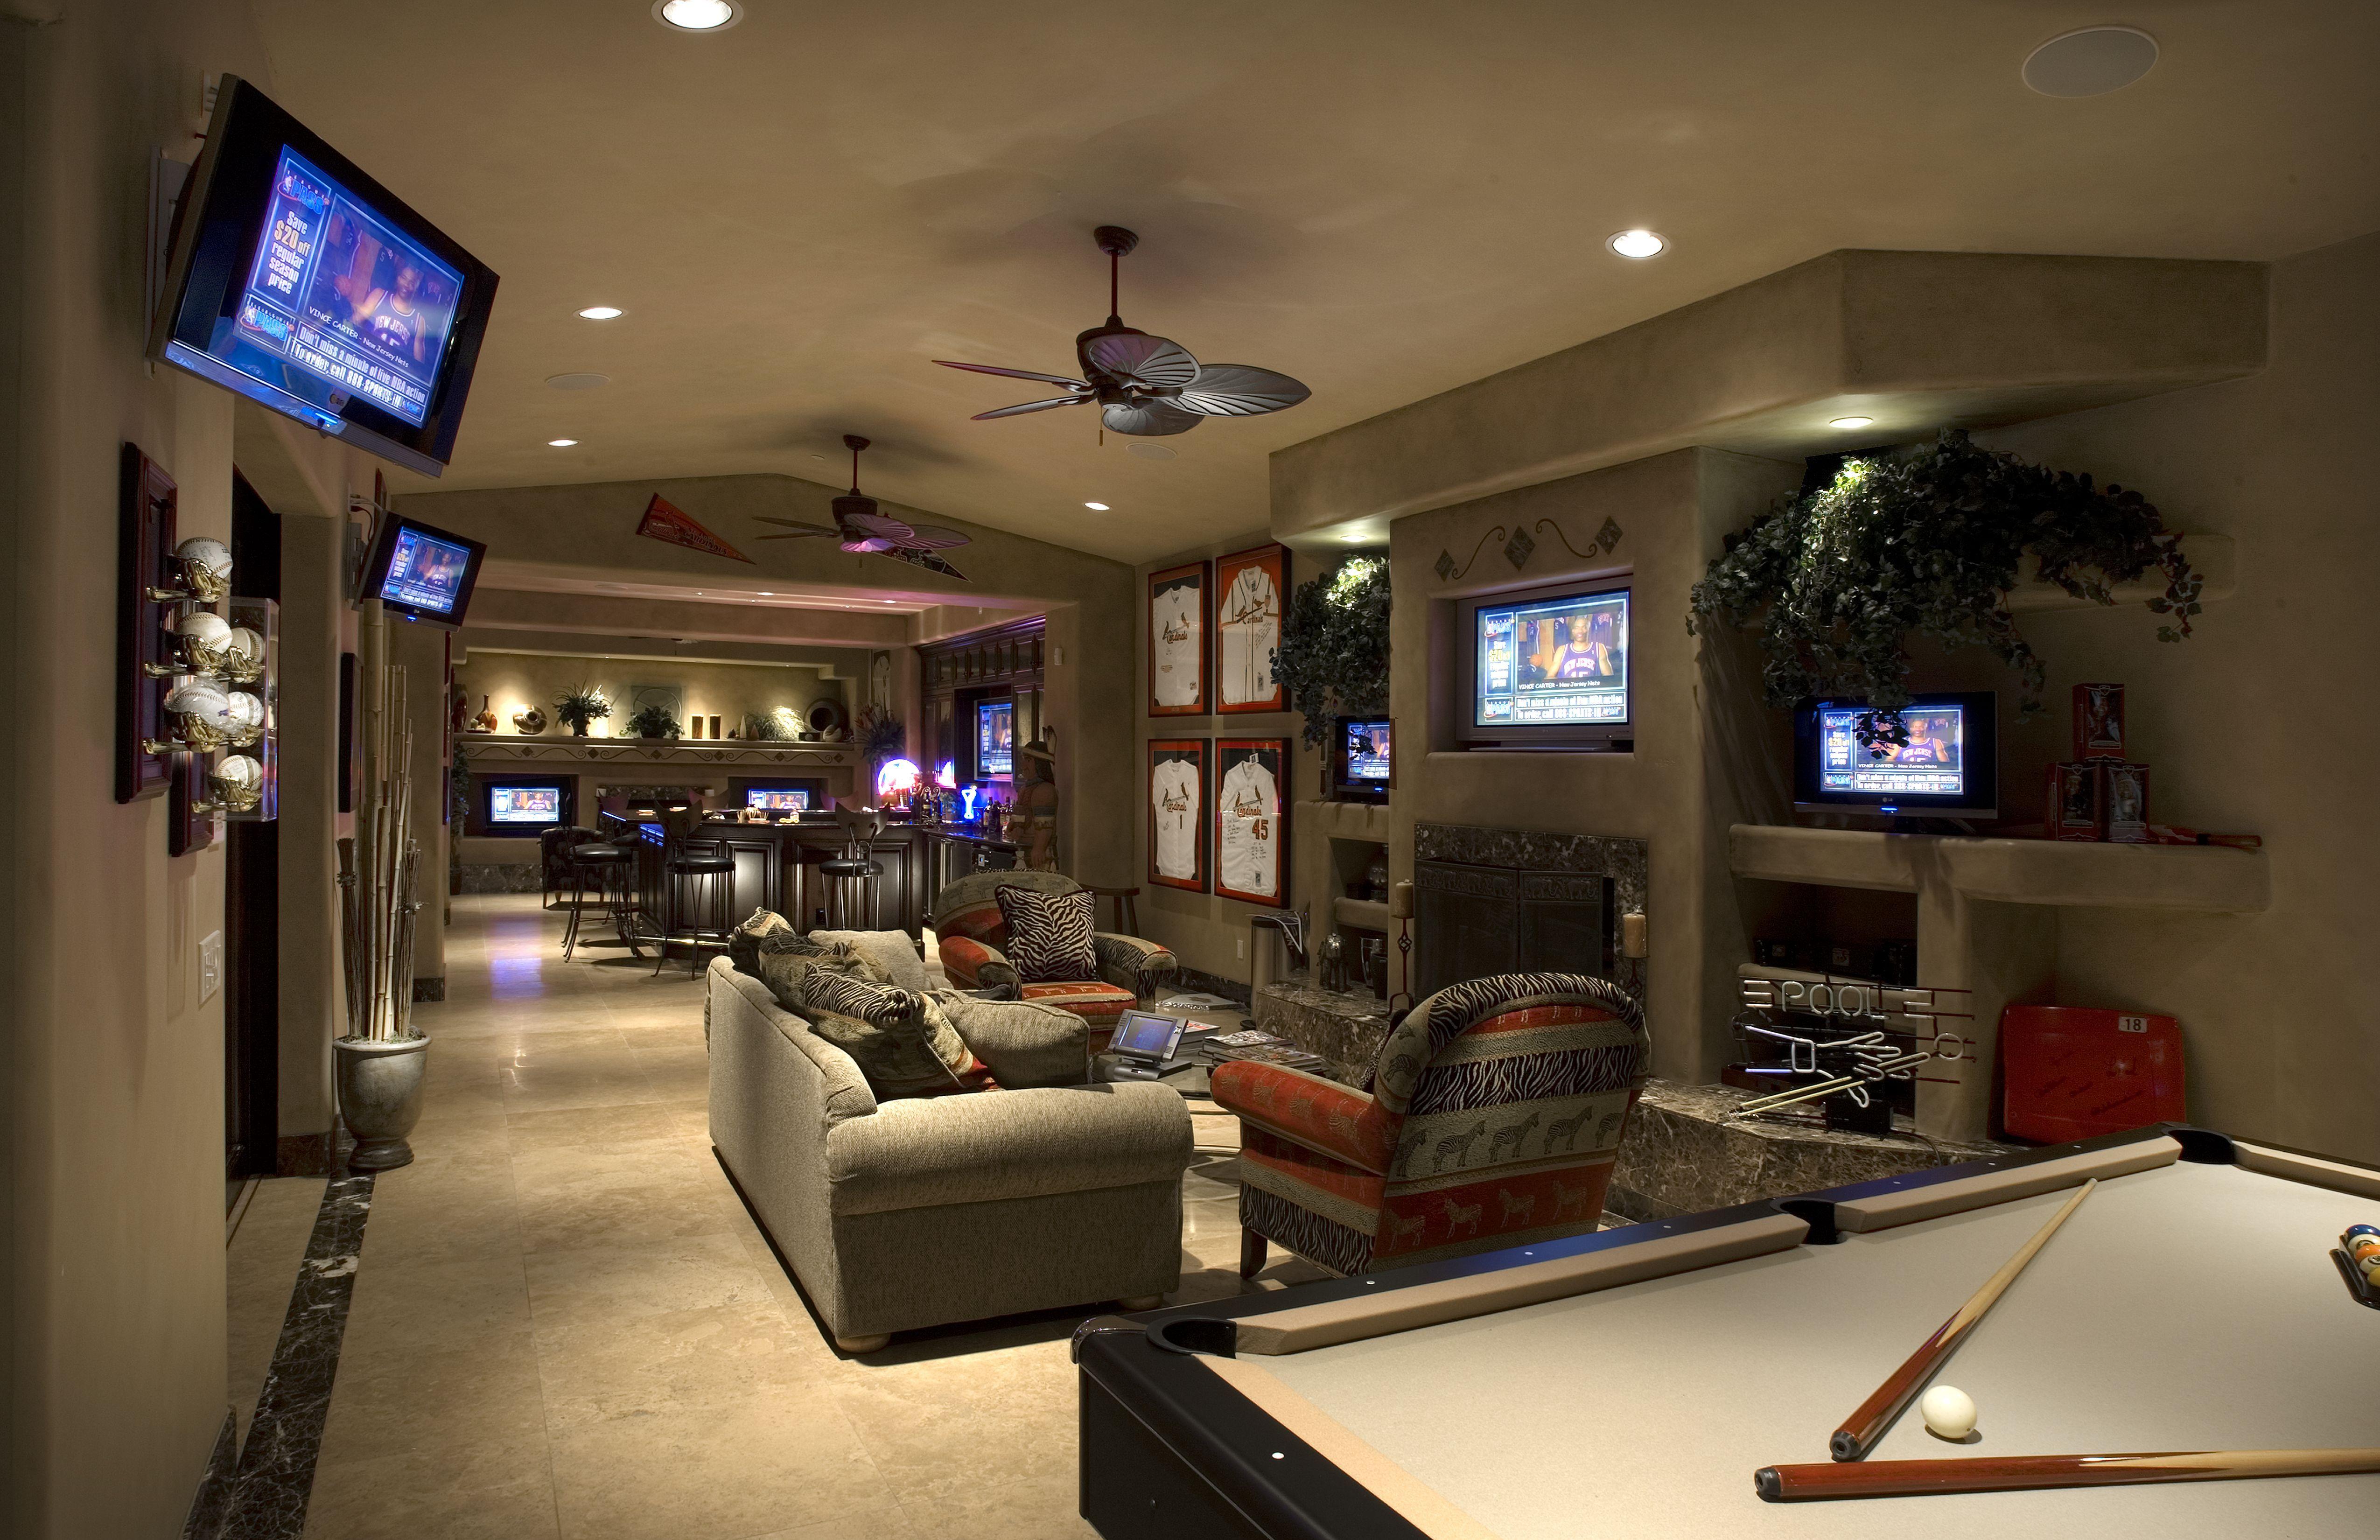 Wallpaper interior game room bar pool table billiard game room 5100x3300